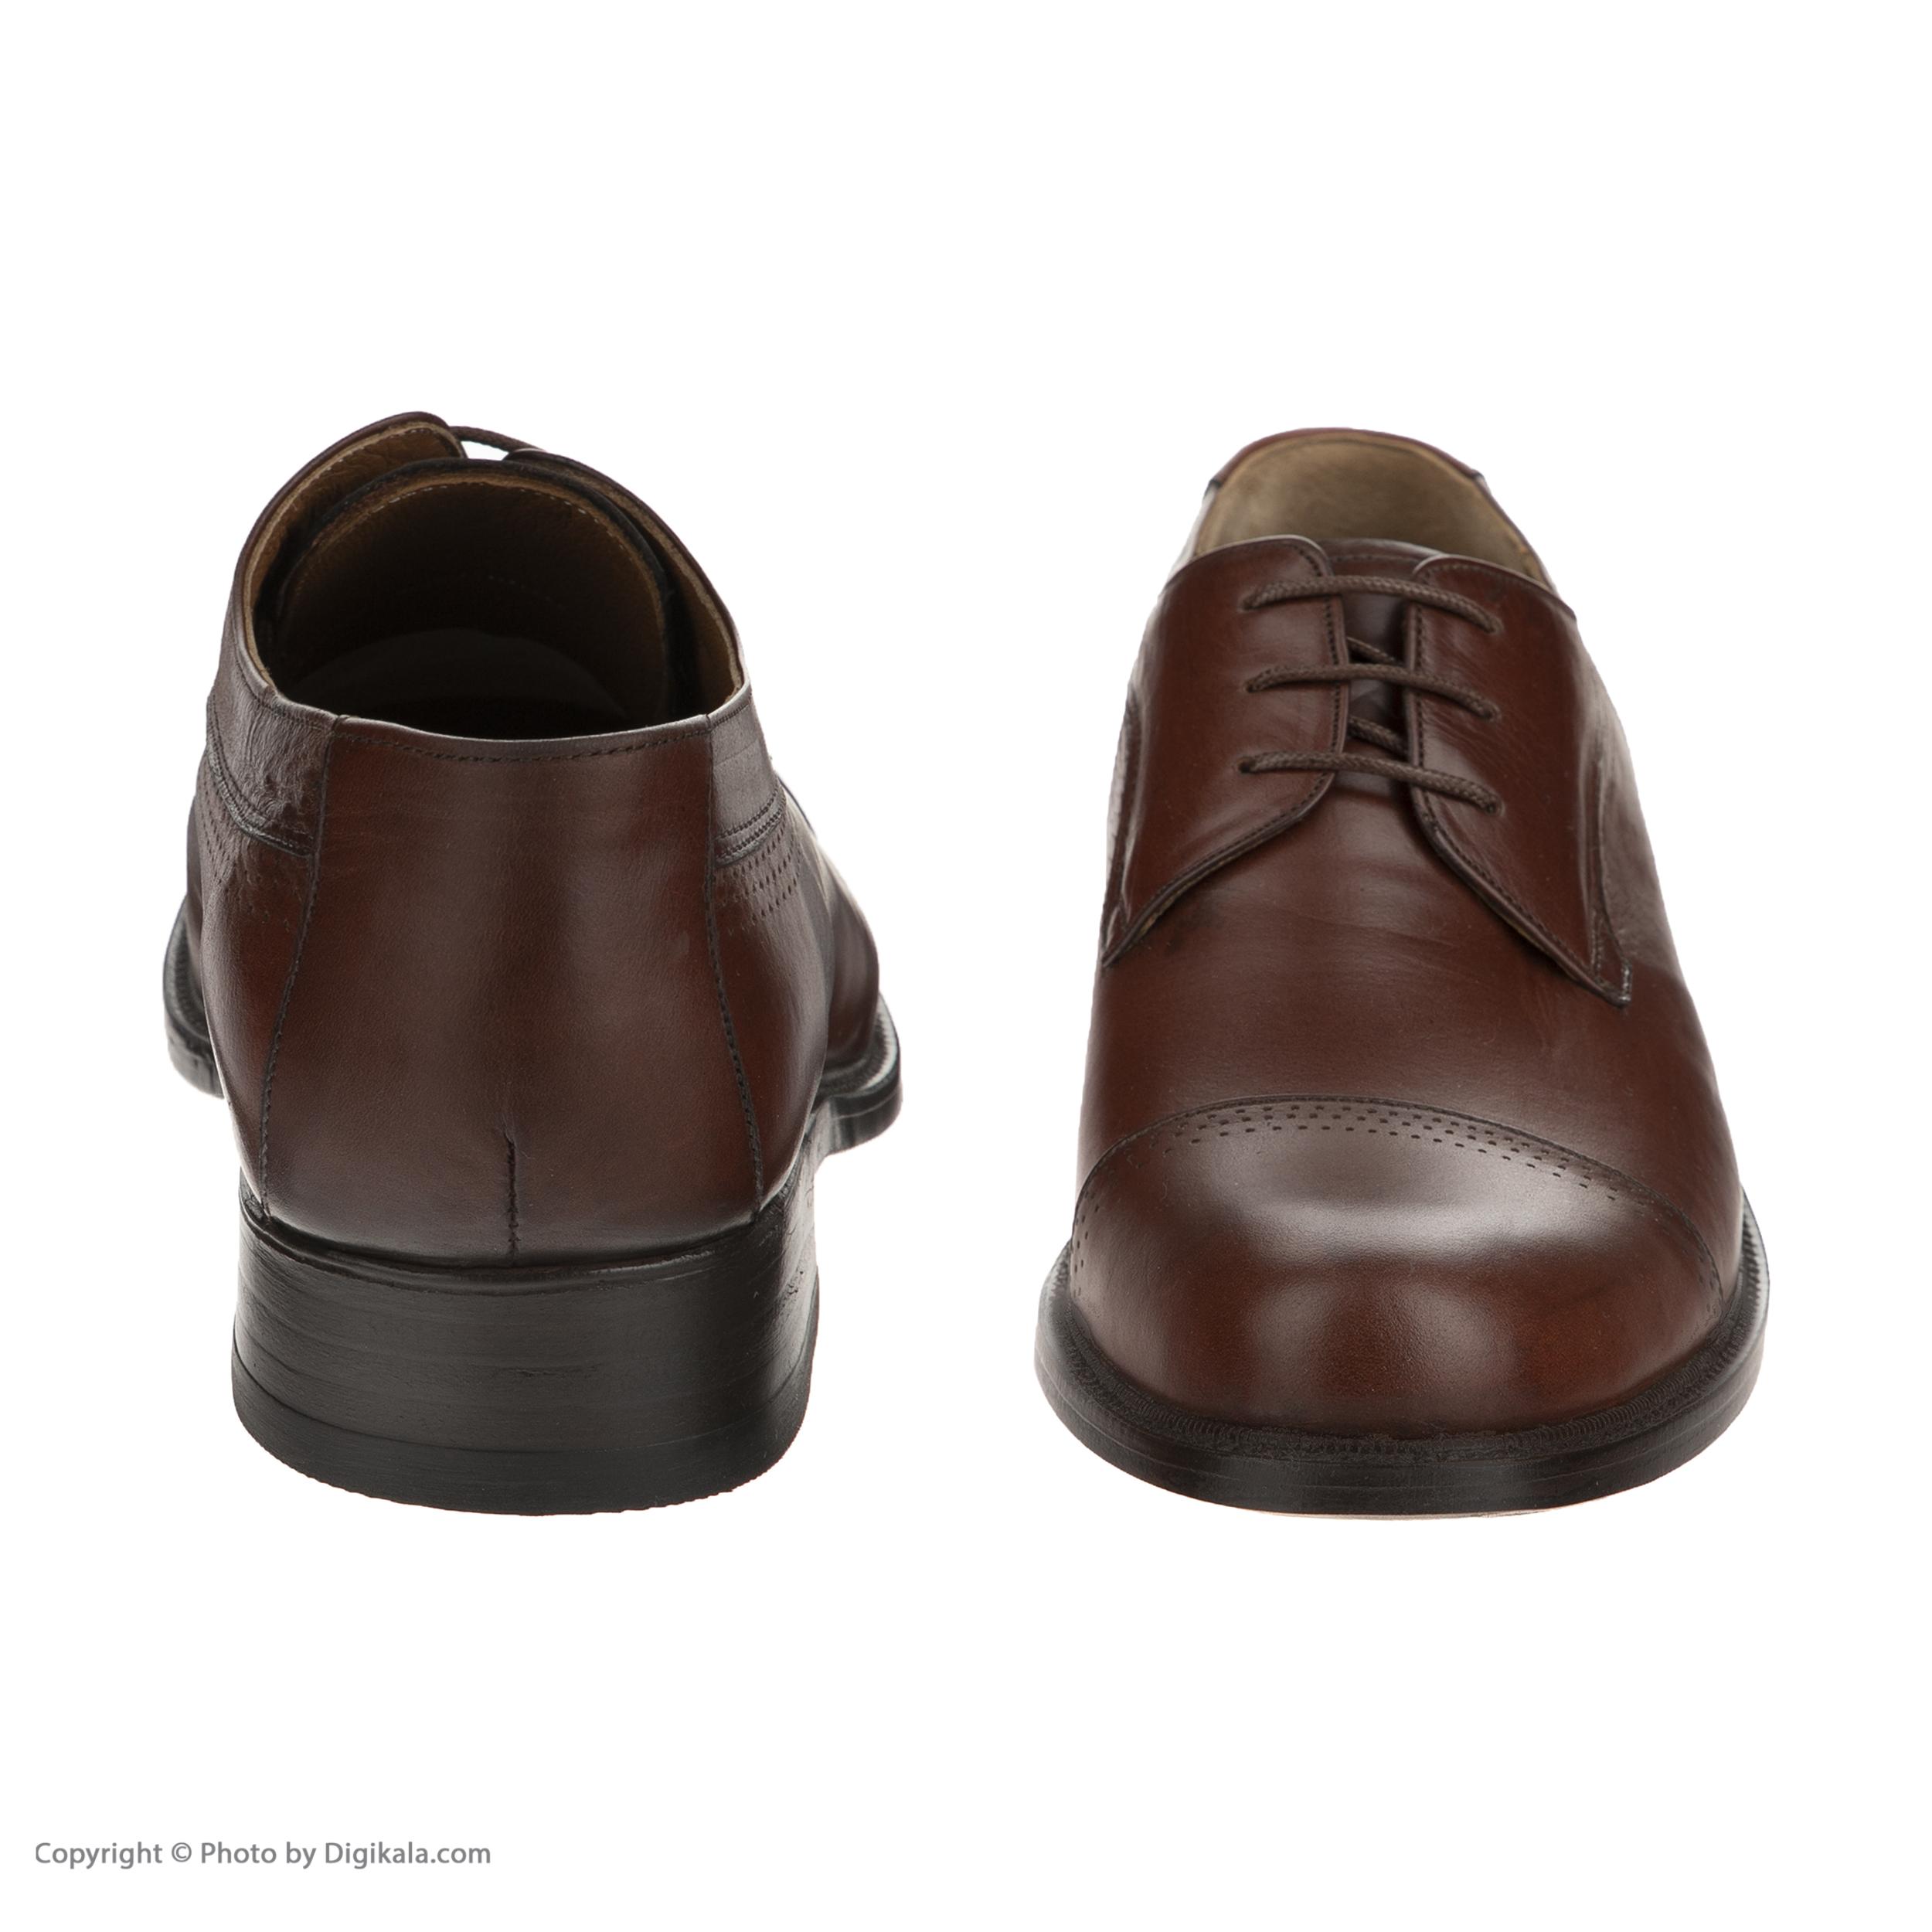 کفش مردانه نظری کد 431 -  - 4